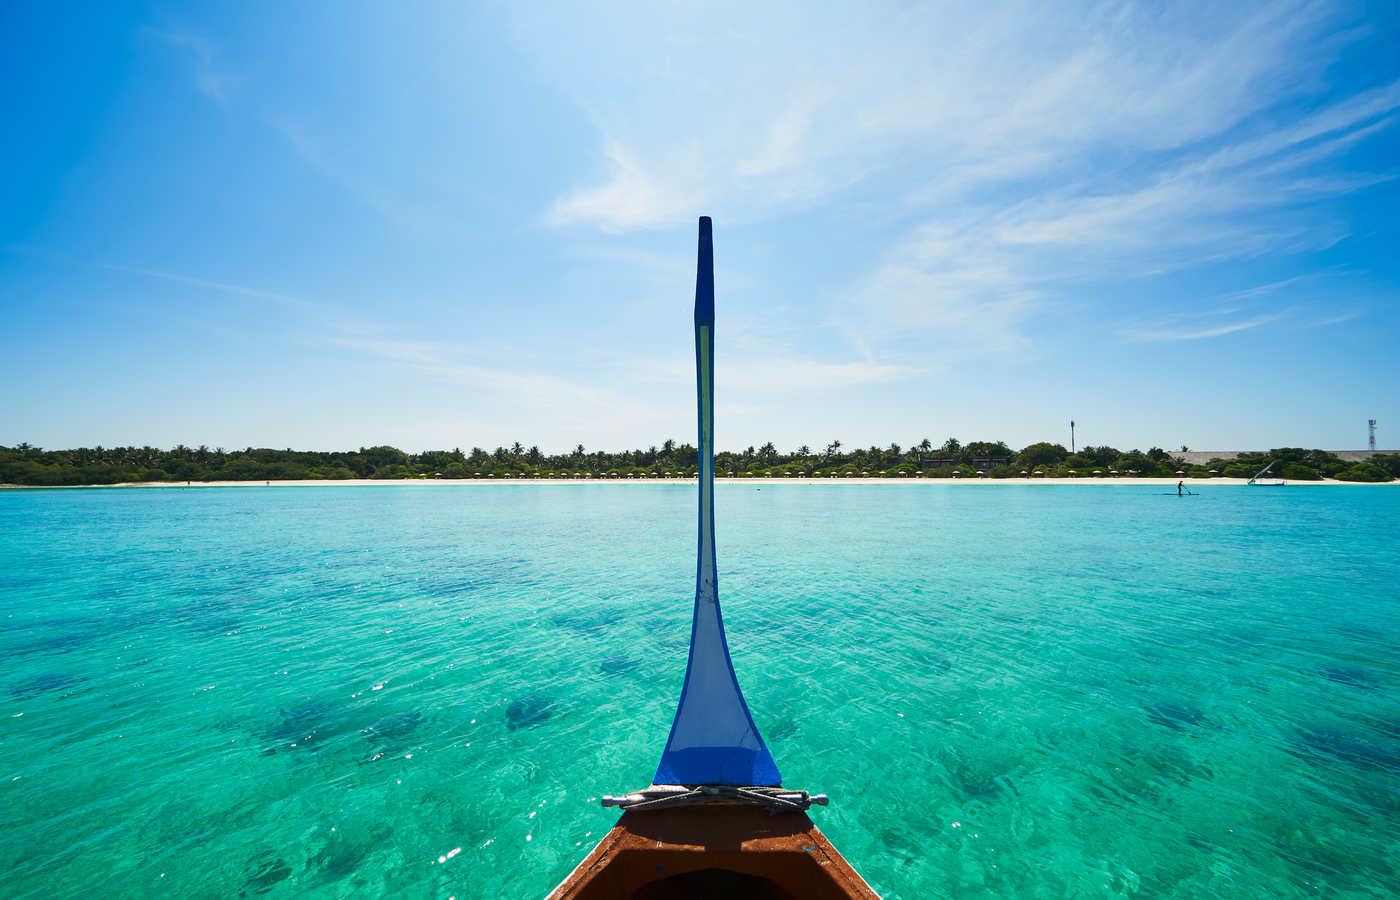 HQ_Maldives_DHONI.jpg